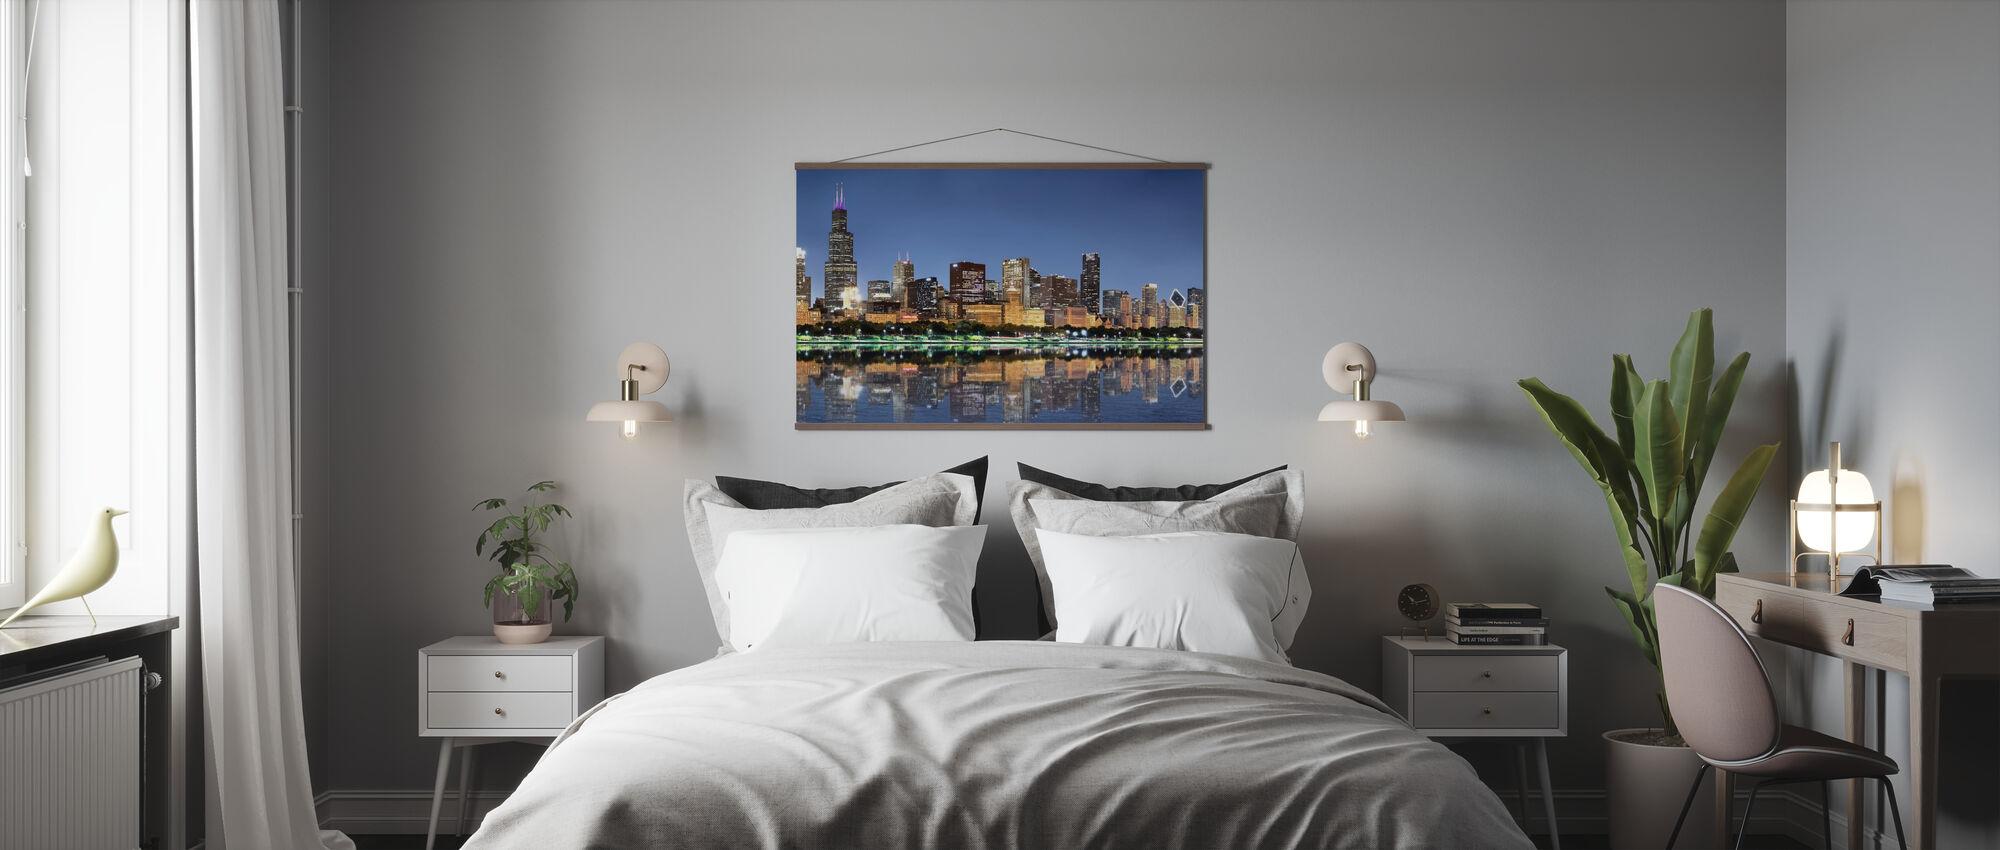 Chicago Skyline - Poster - Bedroom